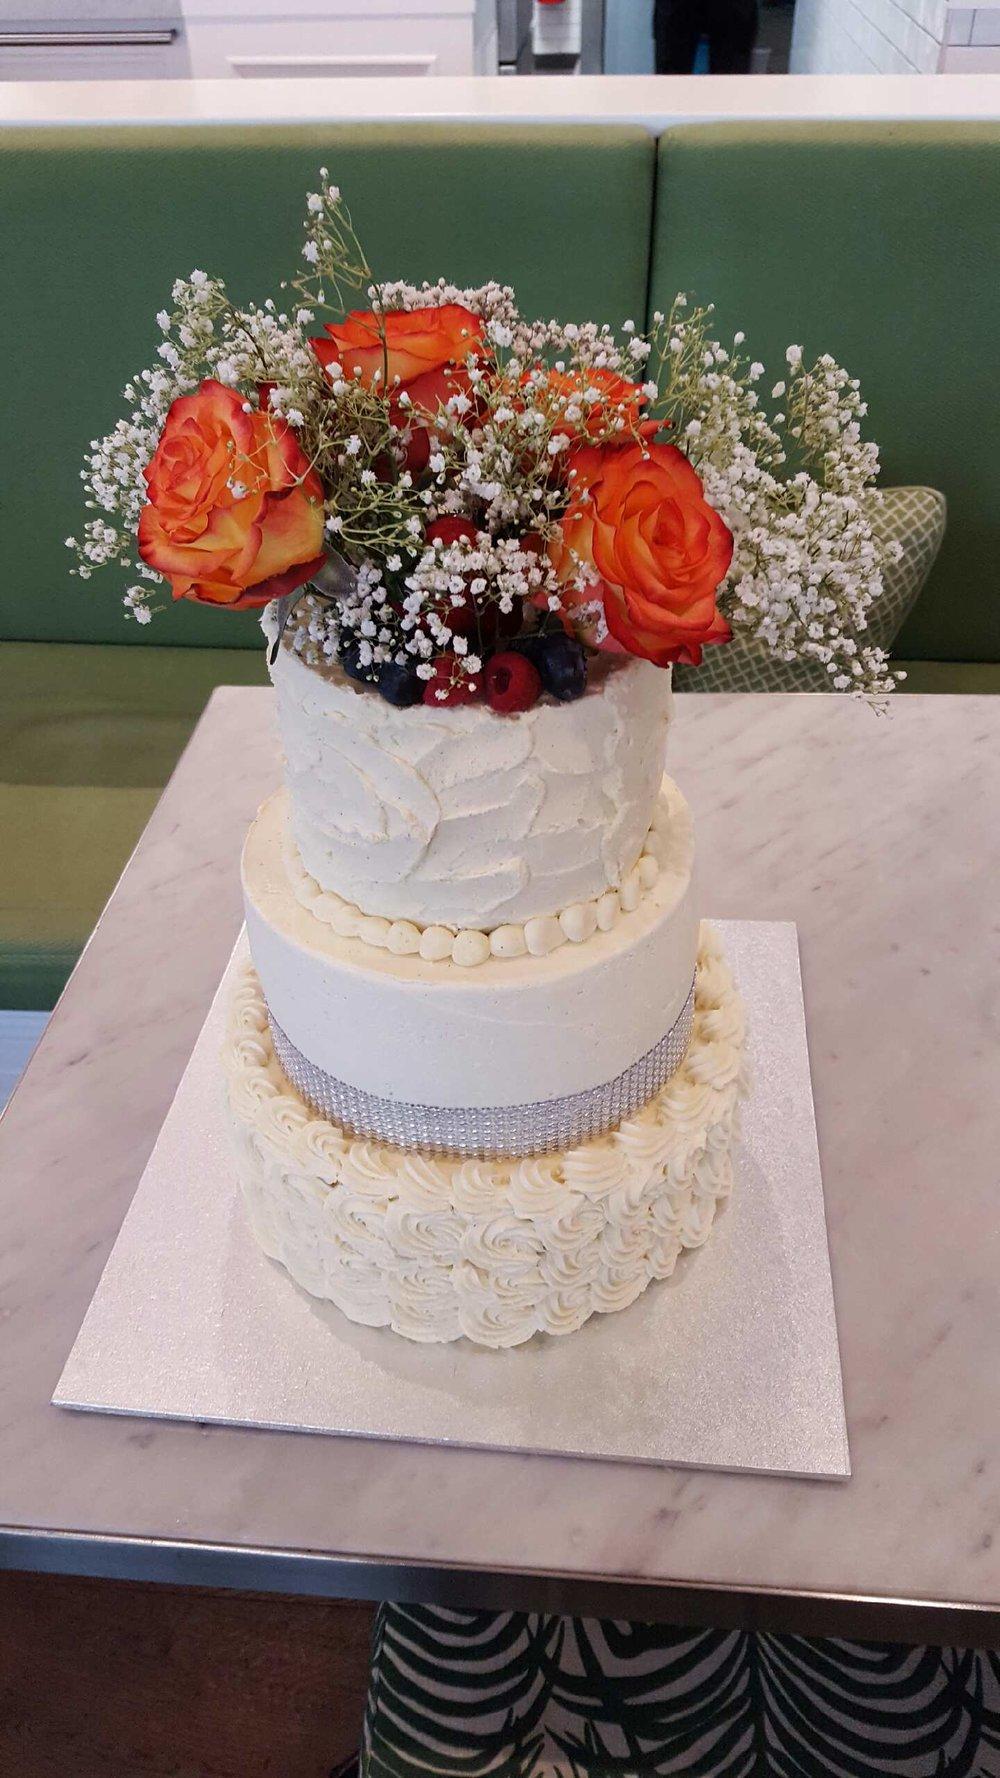 Cake34_Whitechocmudcake.JPG